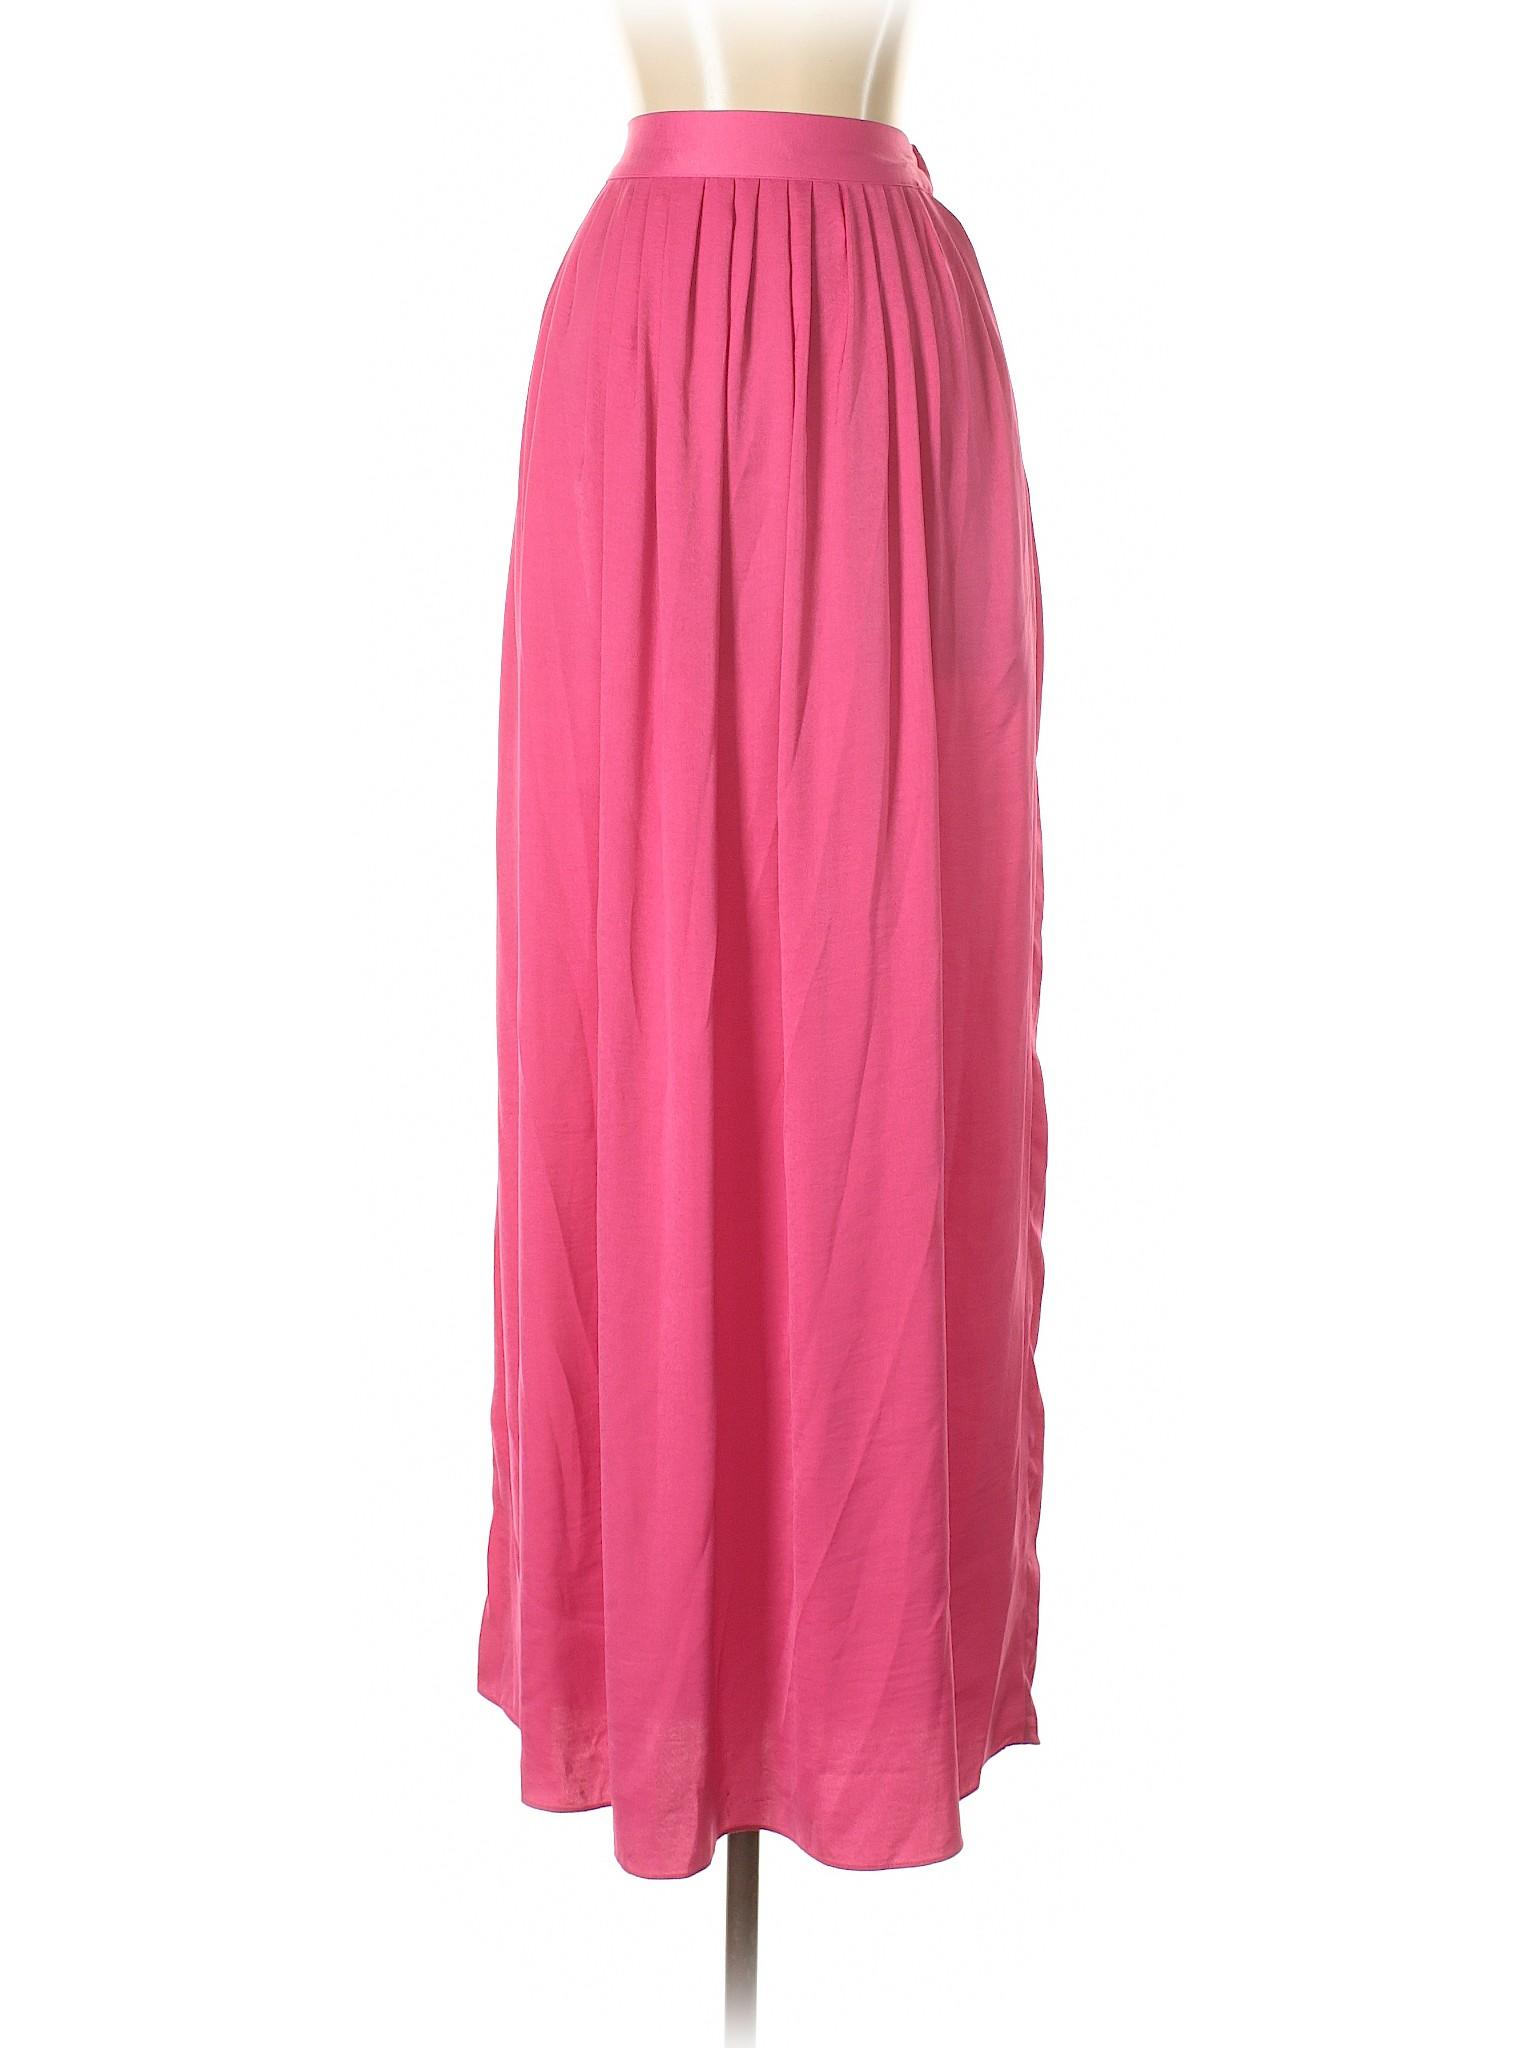 Casual Skirt BCBGMAXAZRIA Boutique Boutique Casual BCBGMAXAZRIA nOwdqR7YR